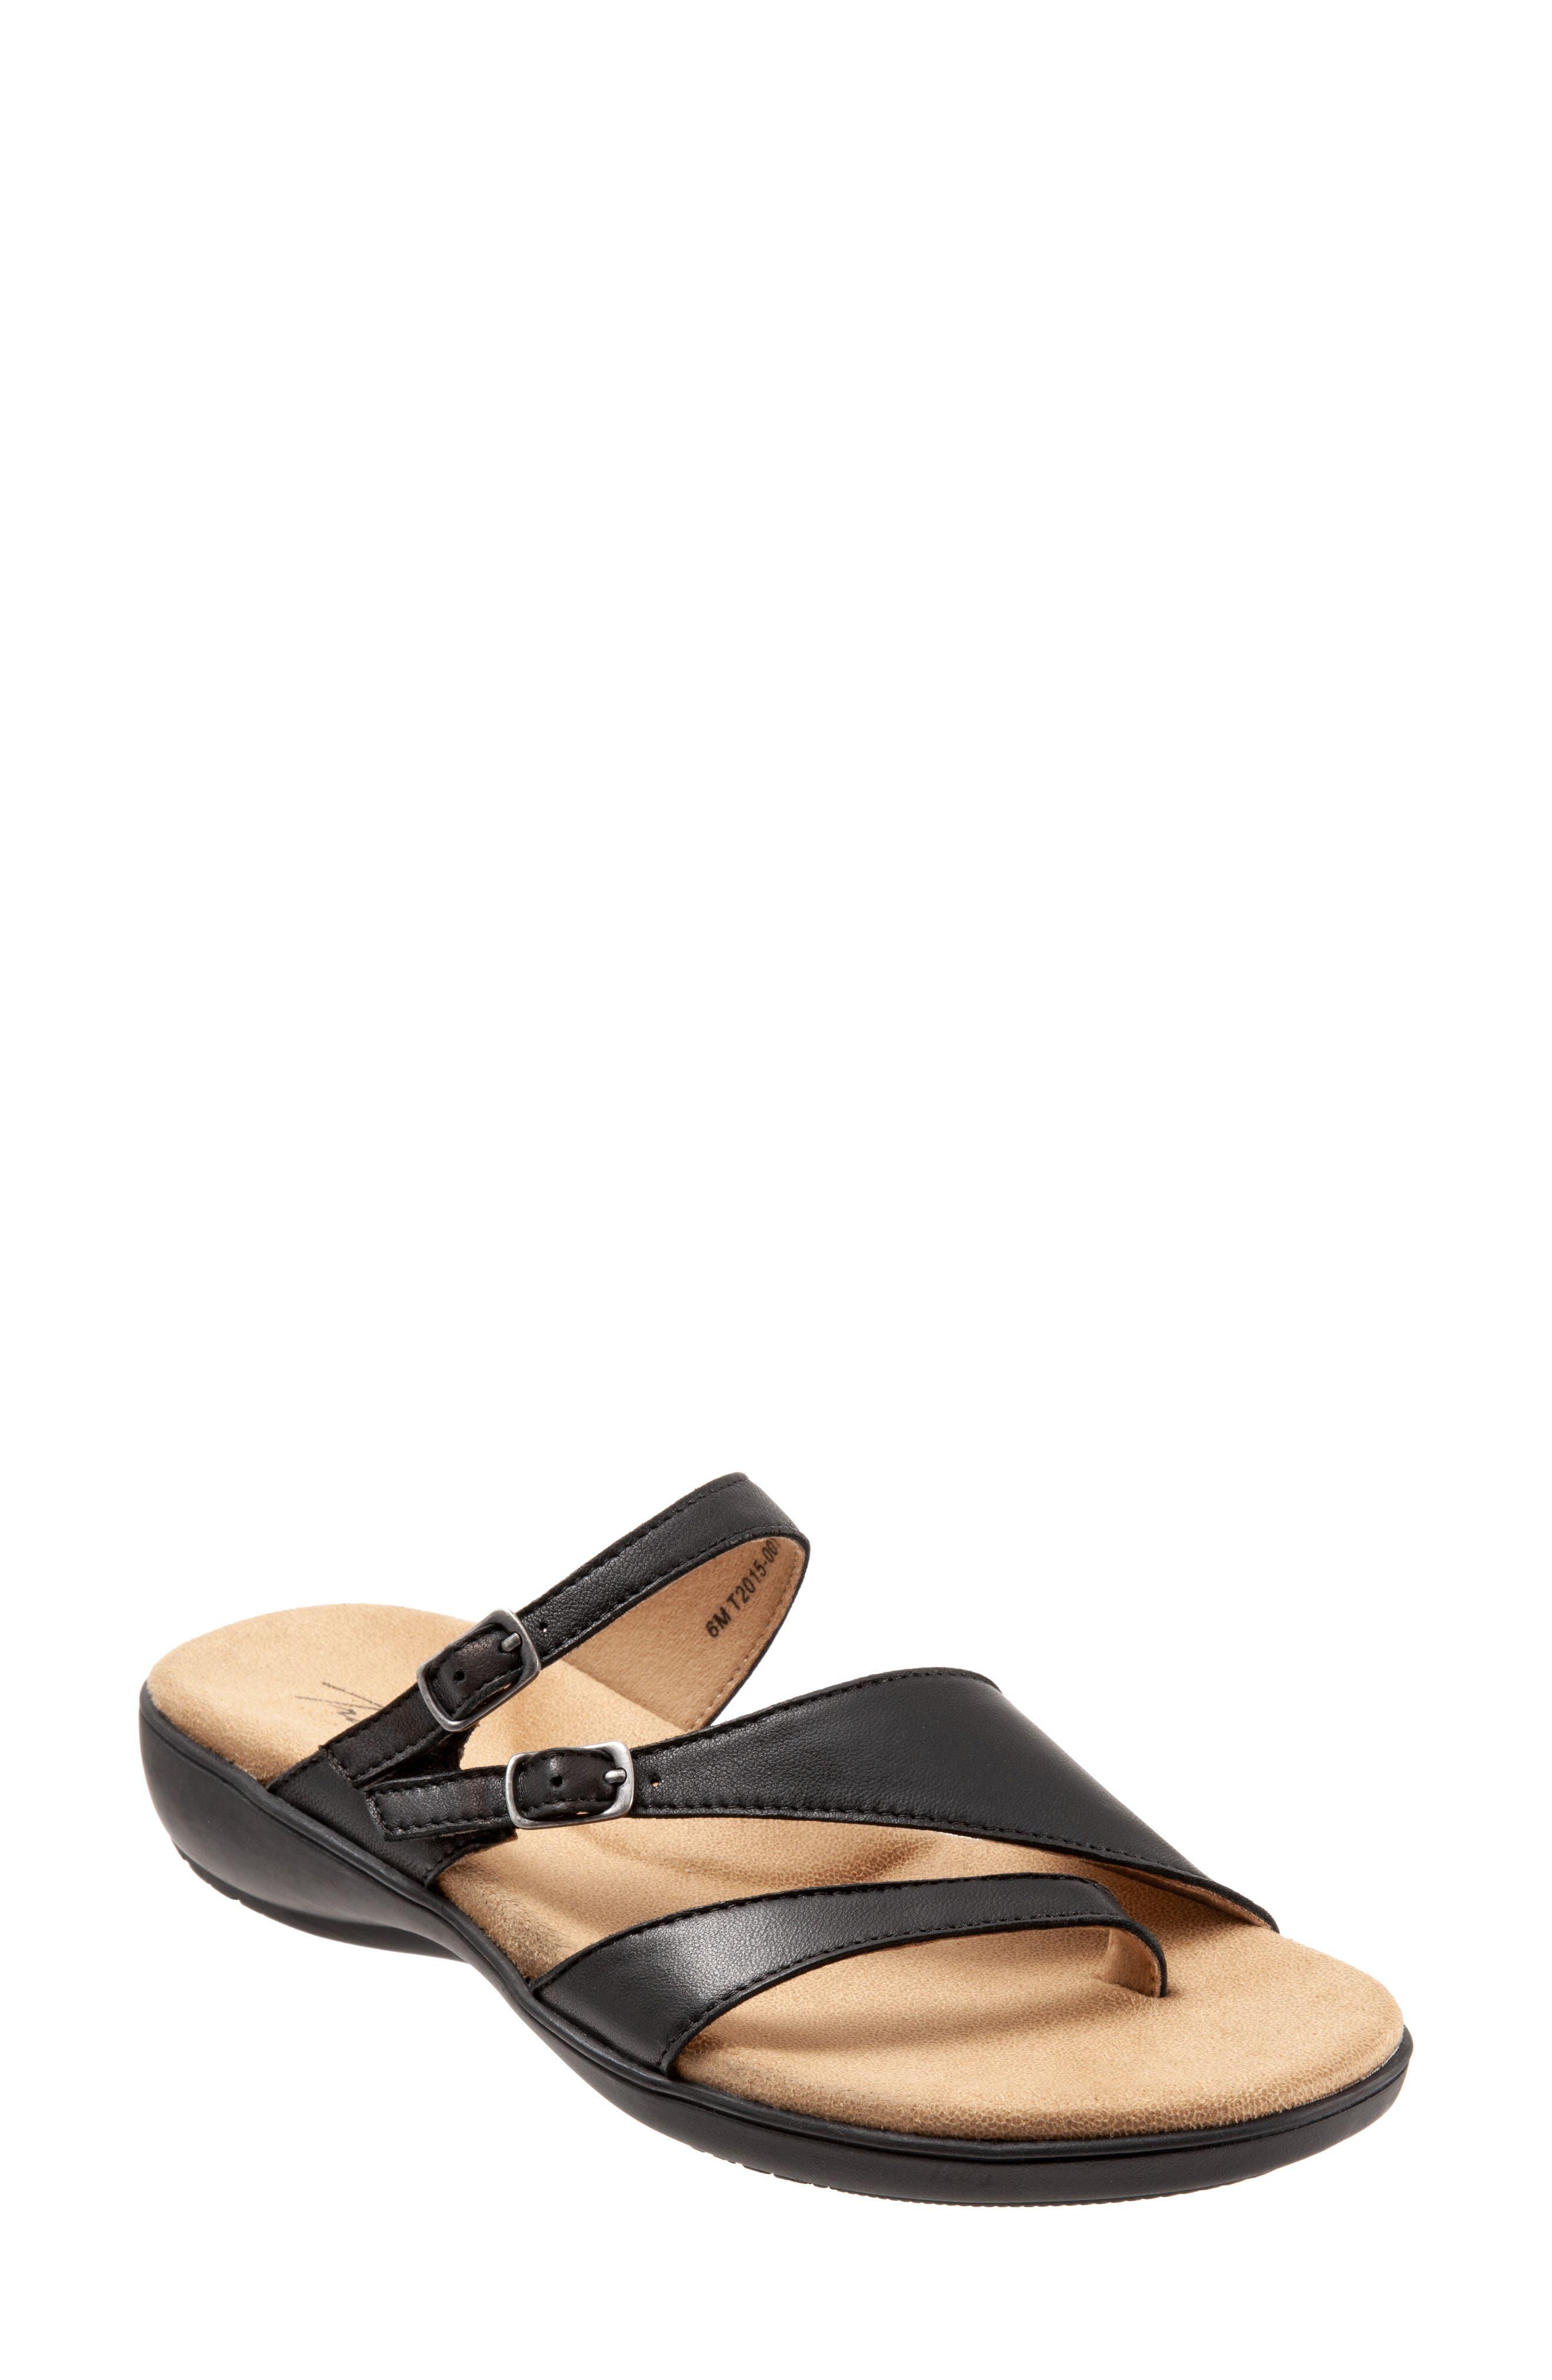 Trotters Sandals RICKI SANDAL